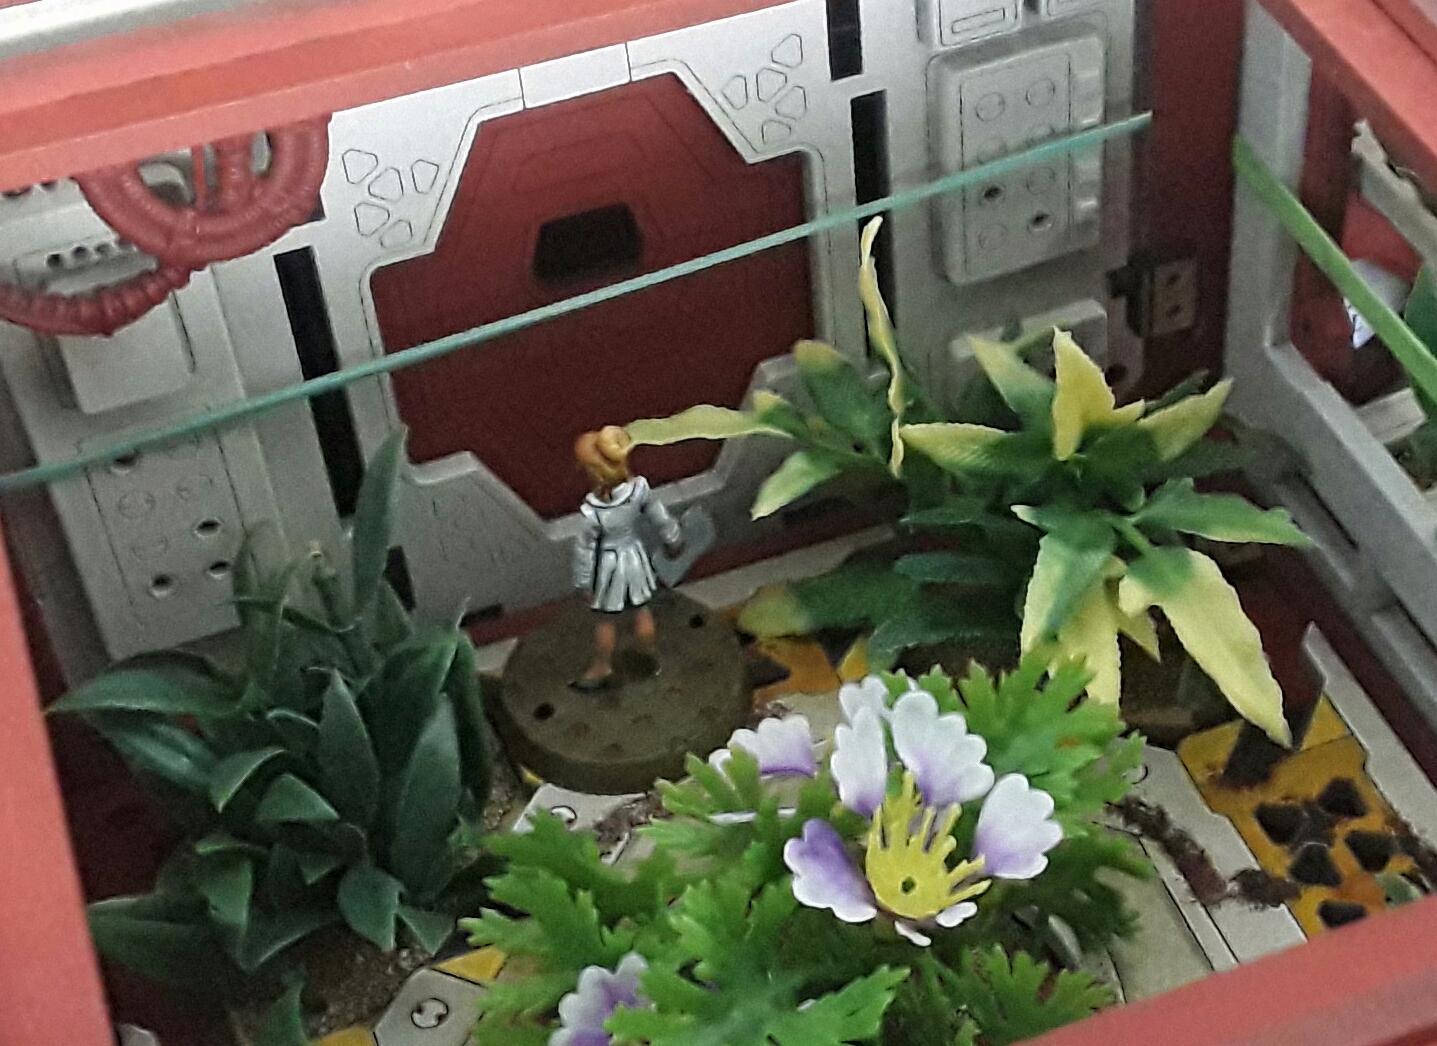 003e-Greenhouse.jpg.5fe9b6c1df841d3e43543f130d22ef98.jpg